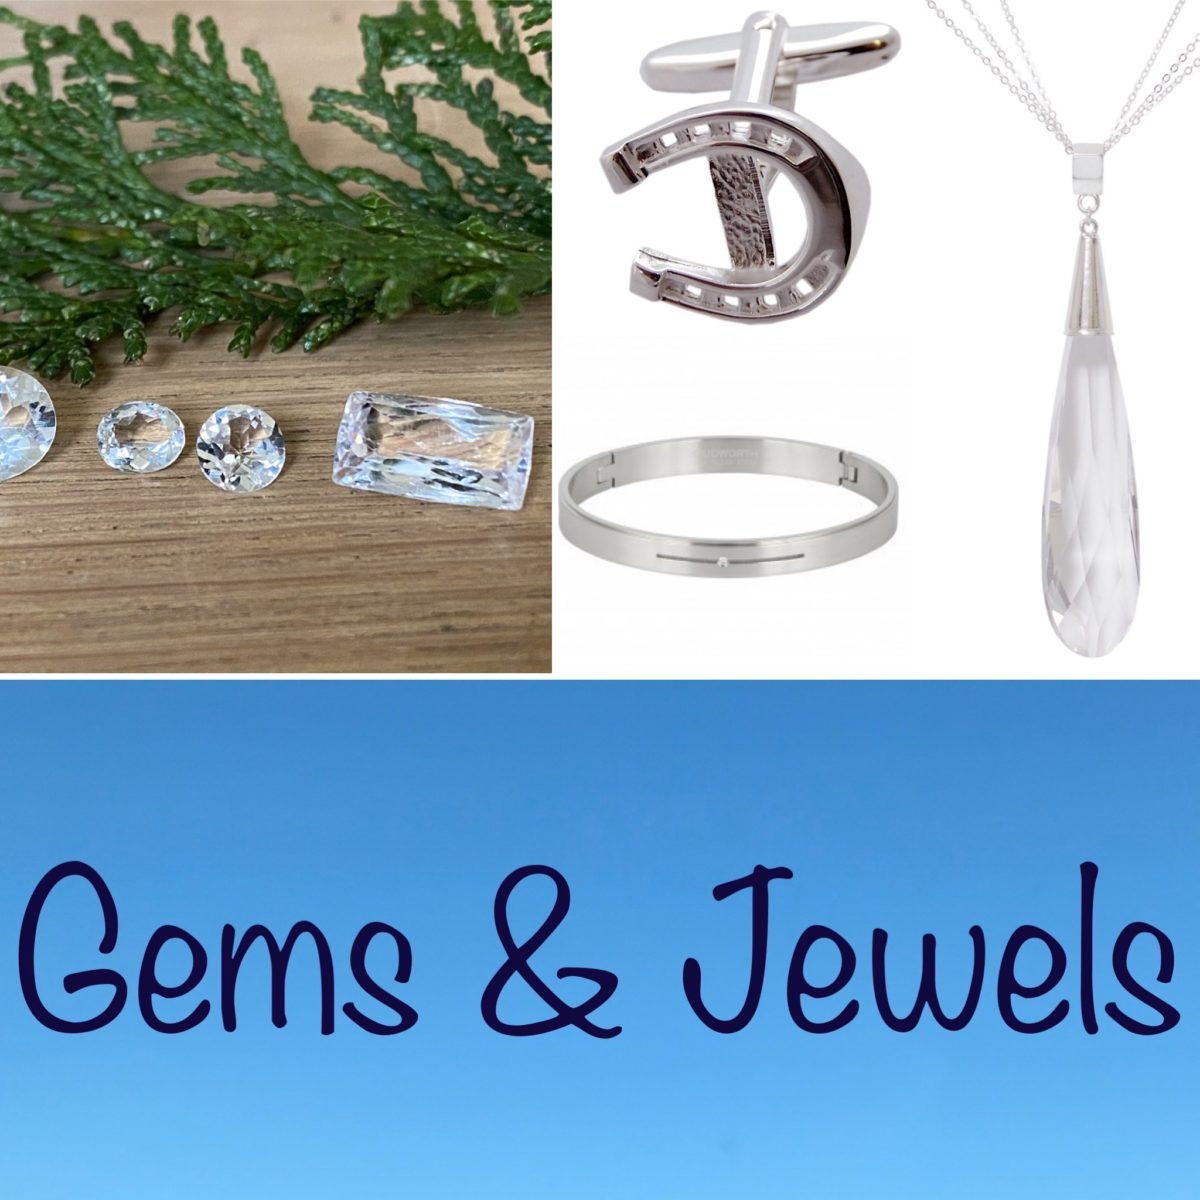 Gems & Jewels -diamant - iFmHeemstede